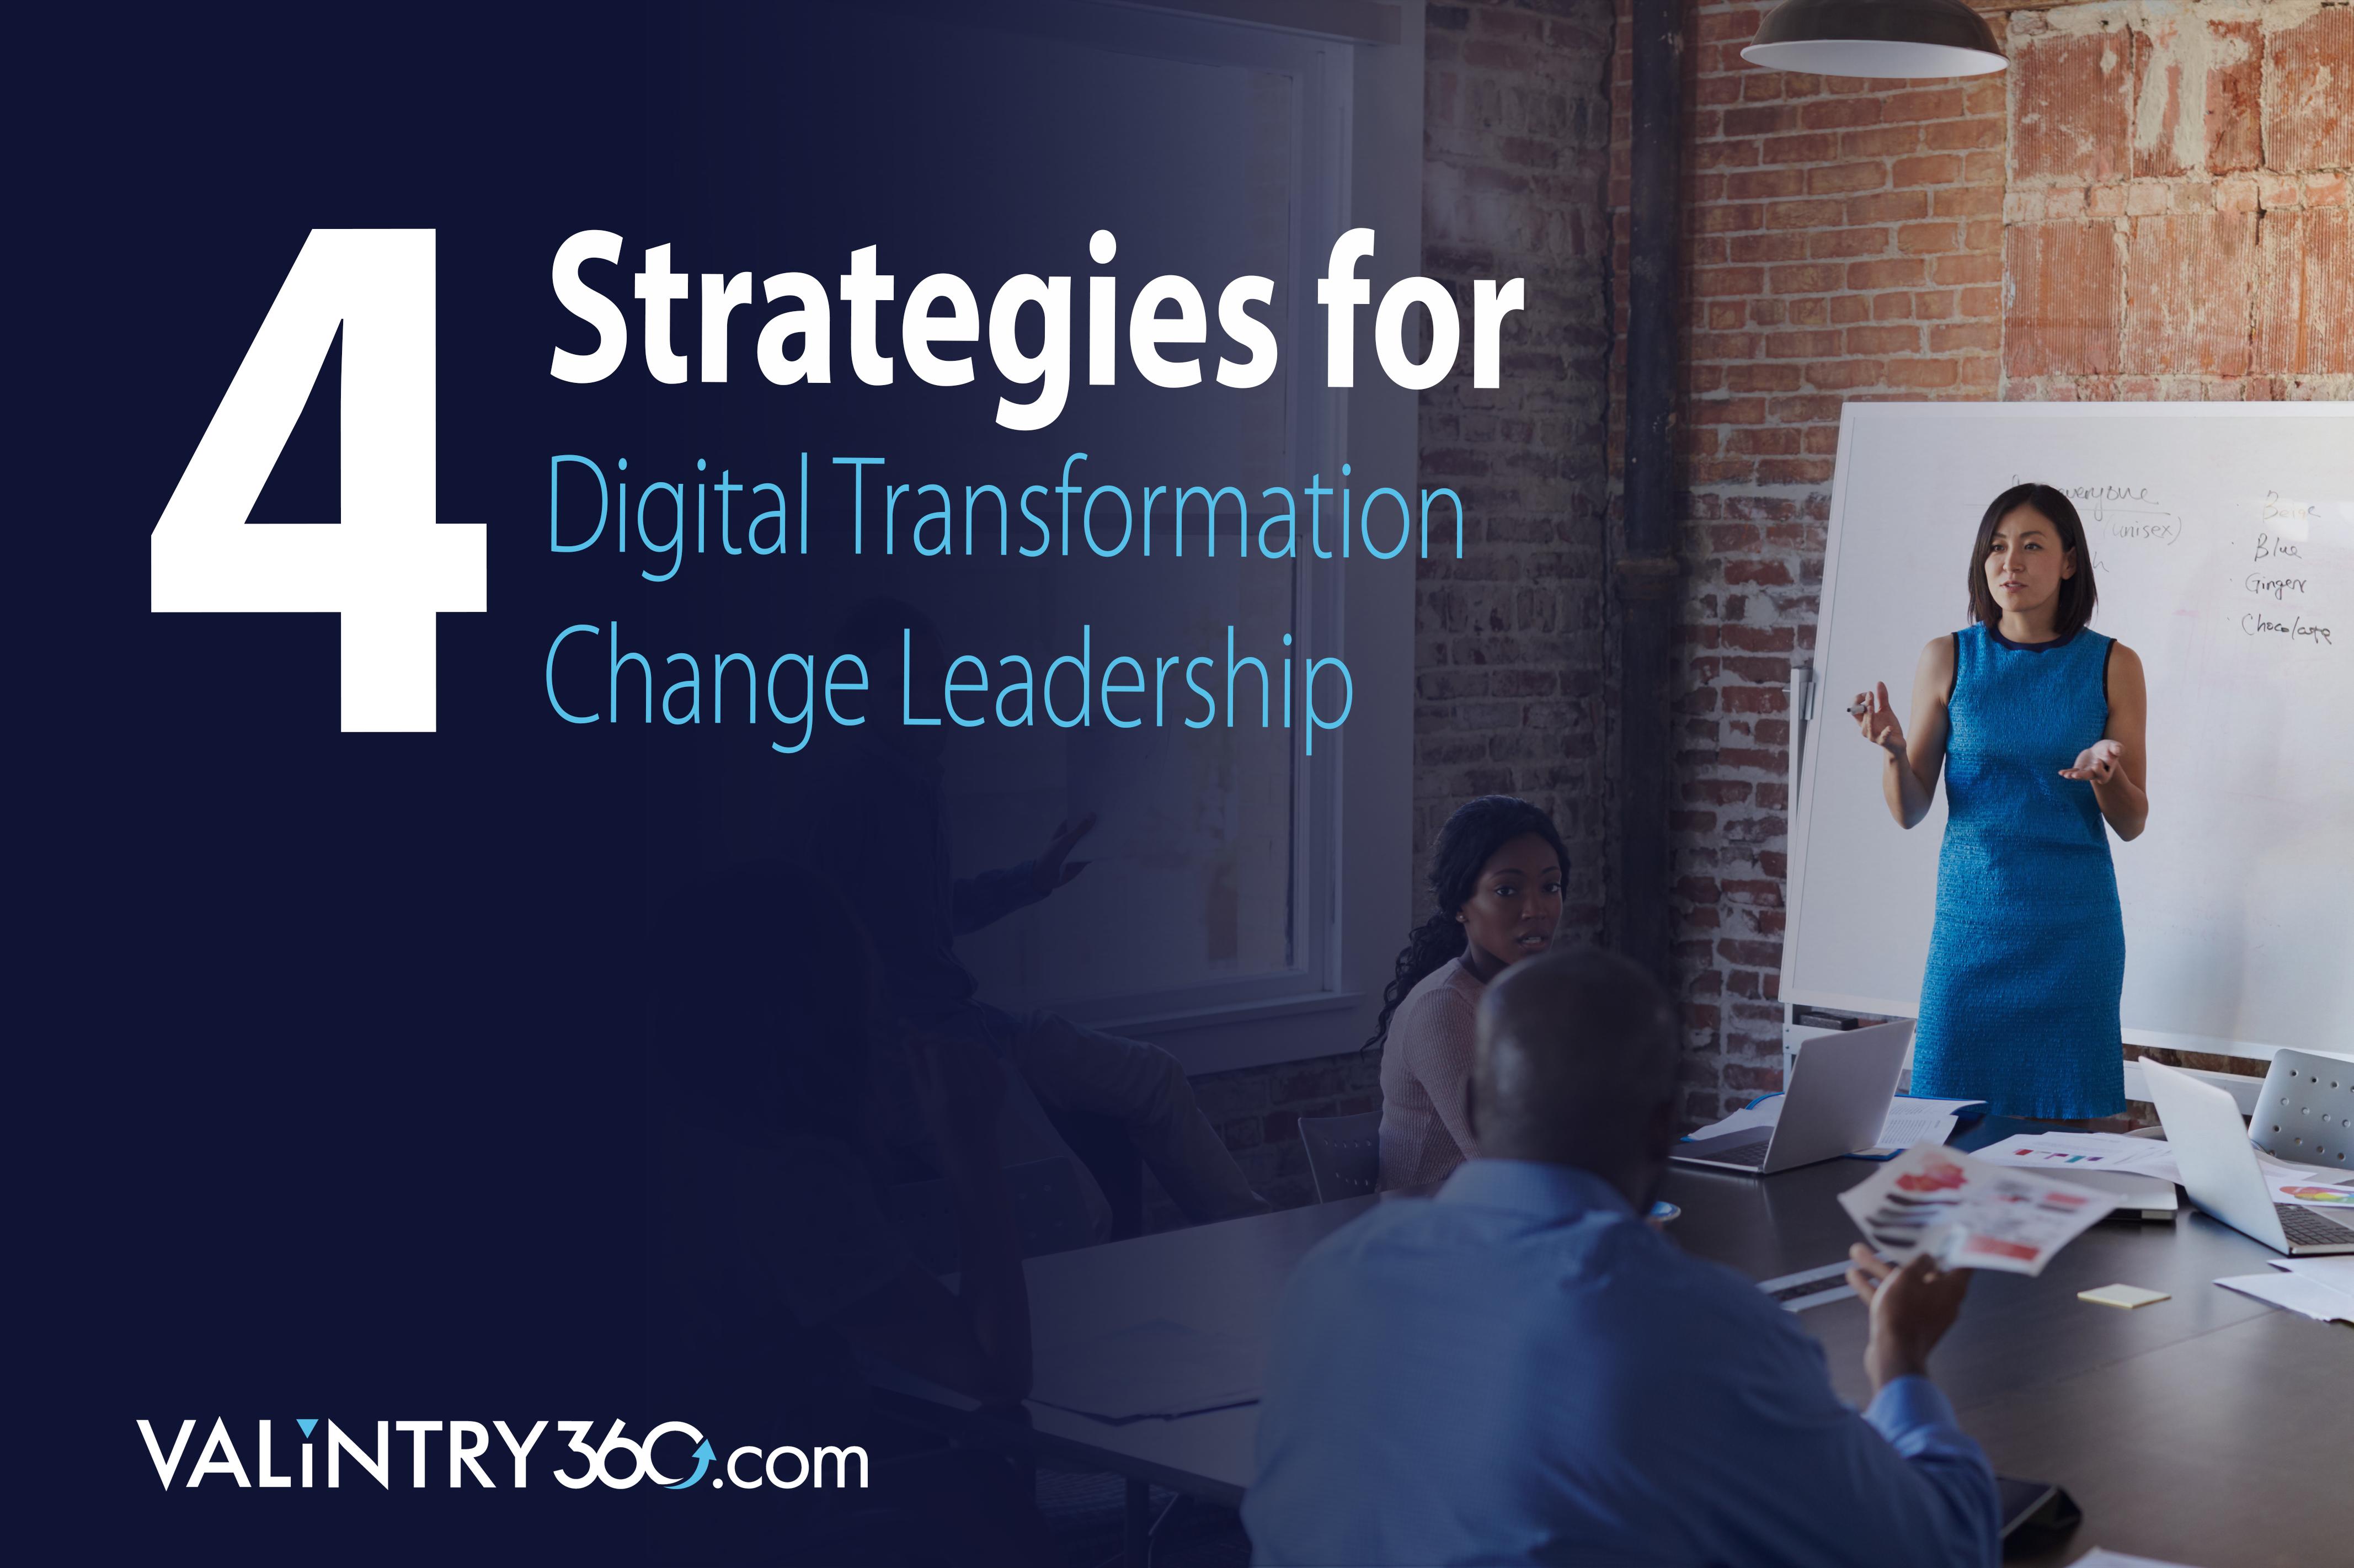 4 Strategies for Digital Transformation Change Leadership